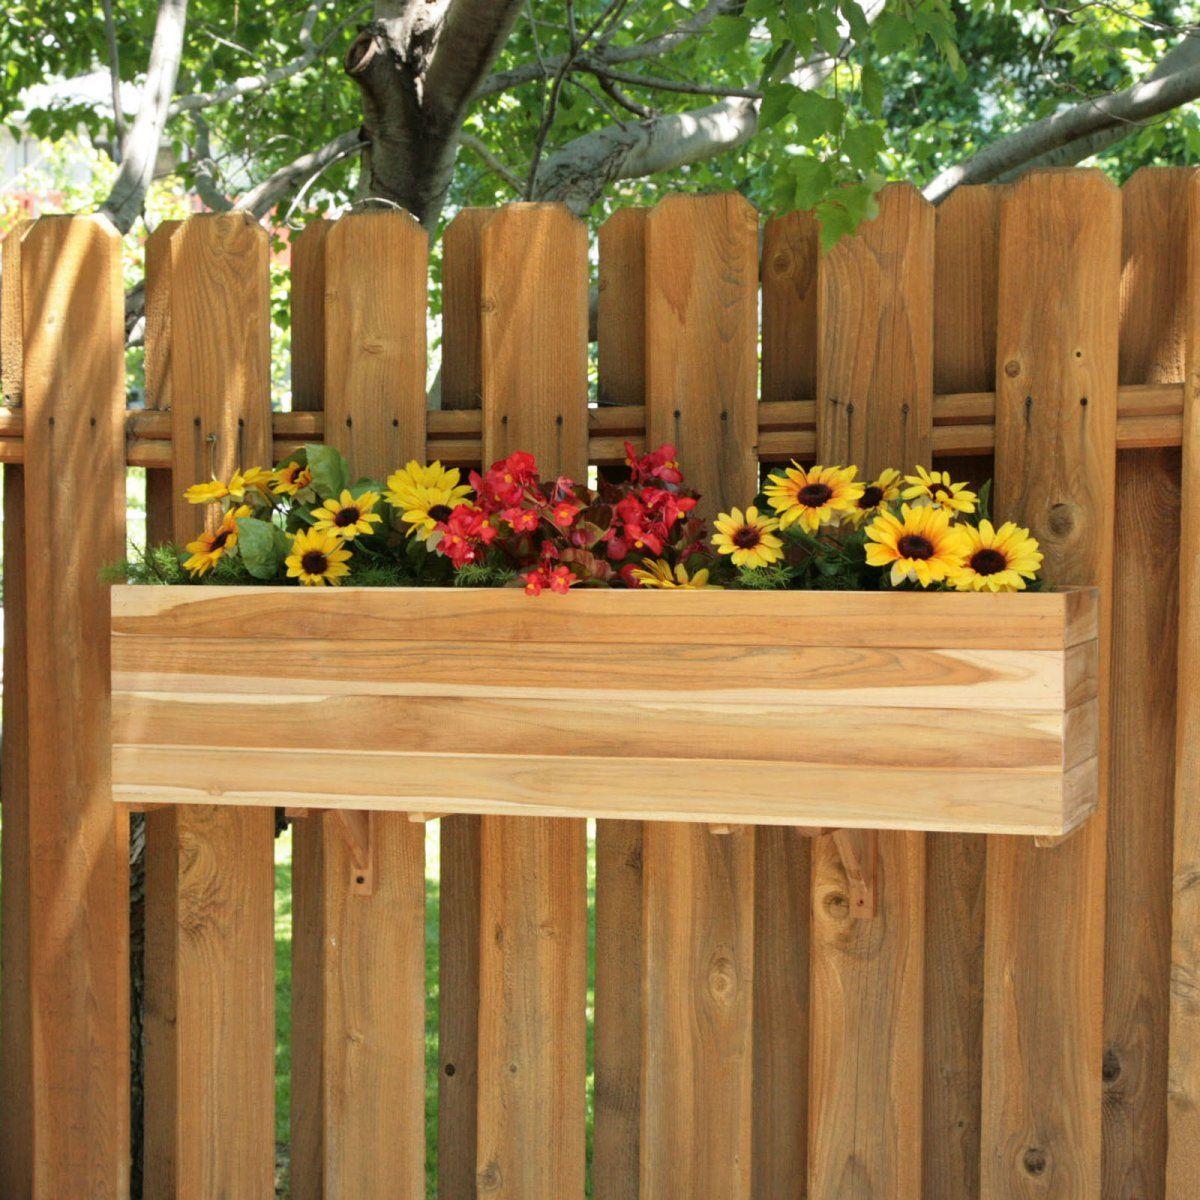 Rectangle Teak Wood Sunshine Flower Box Fence planters